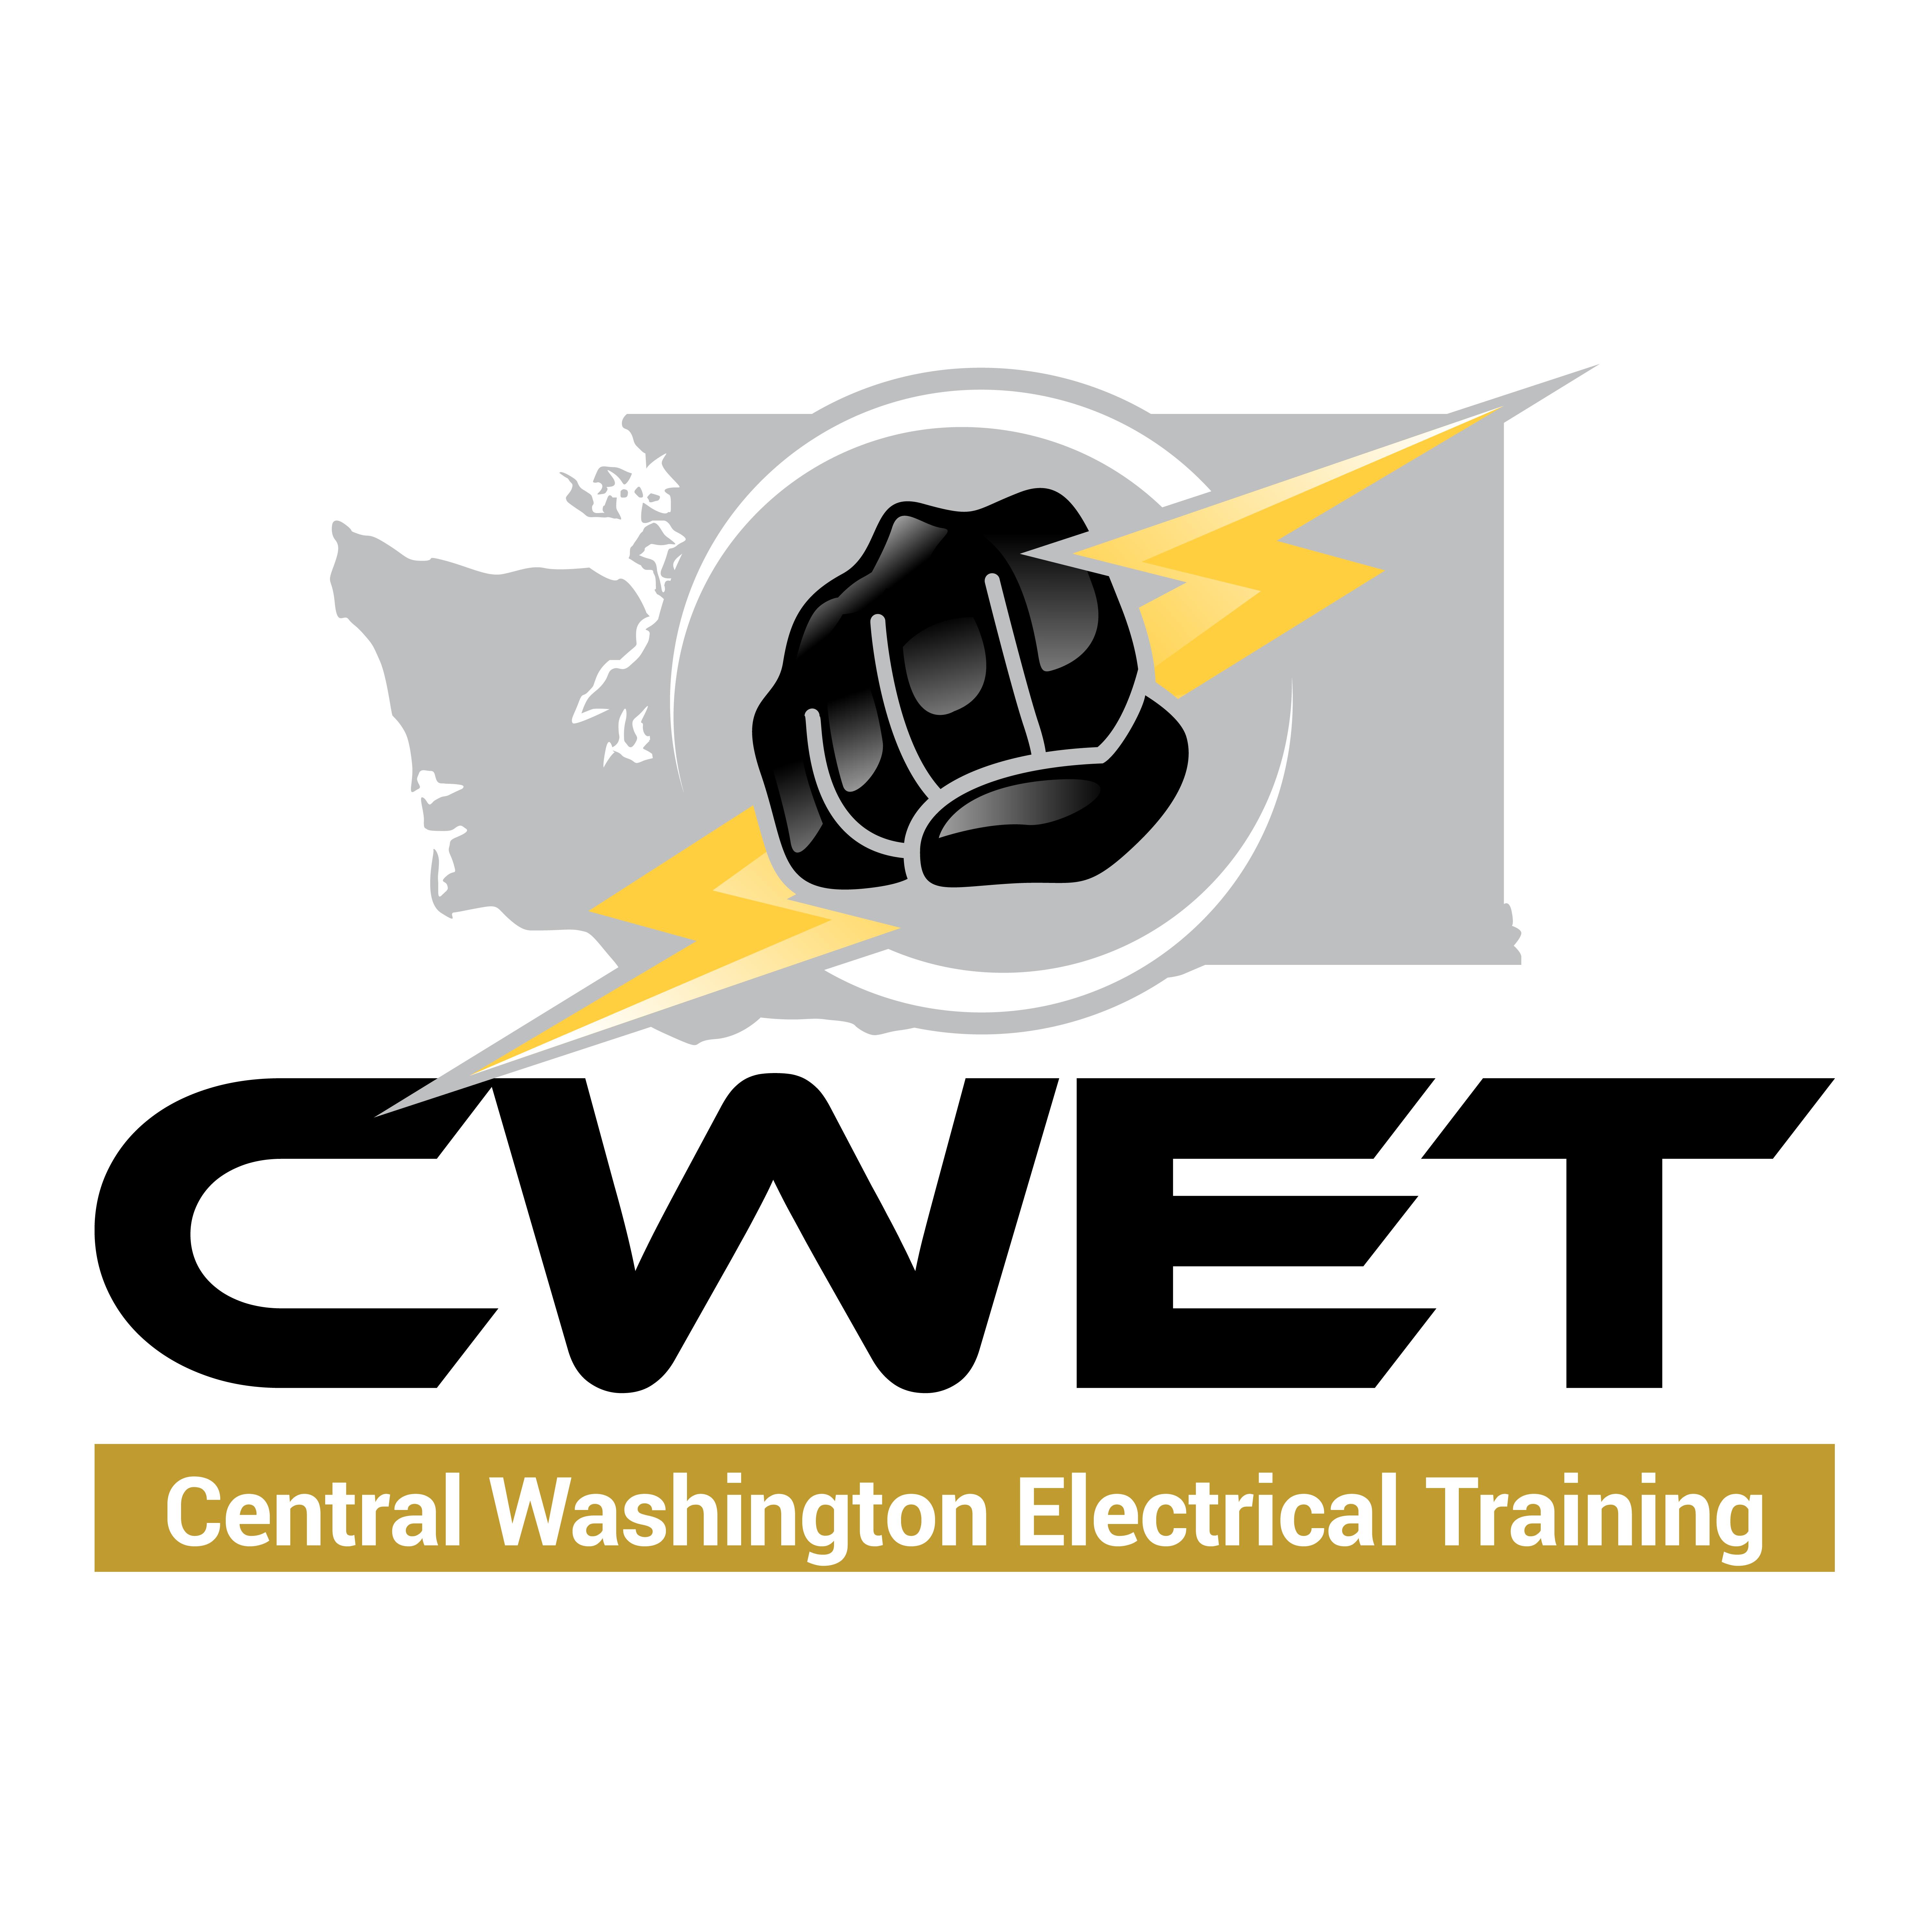 Central Washington Electrical Training